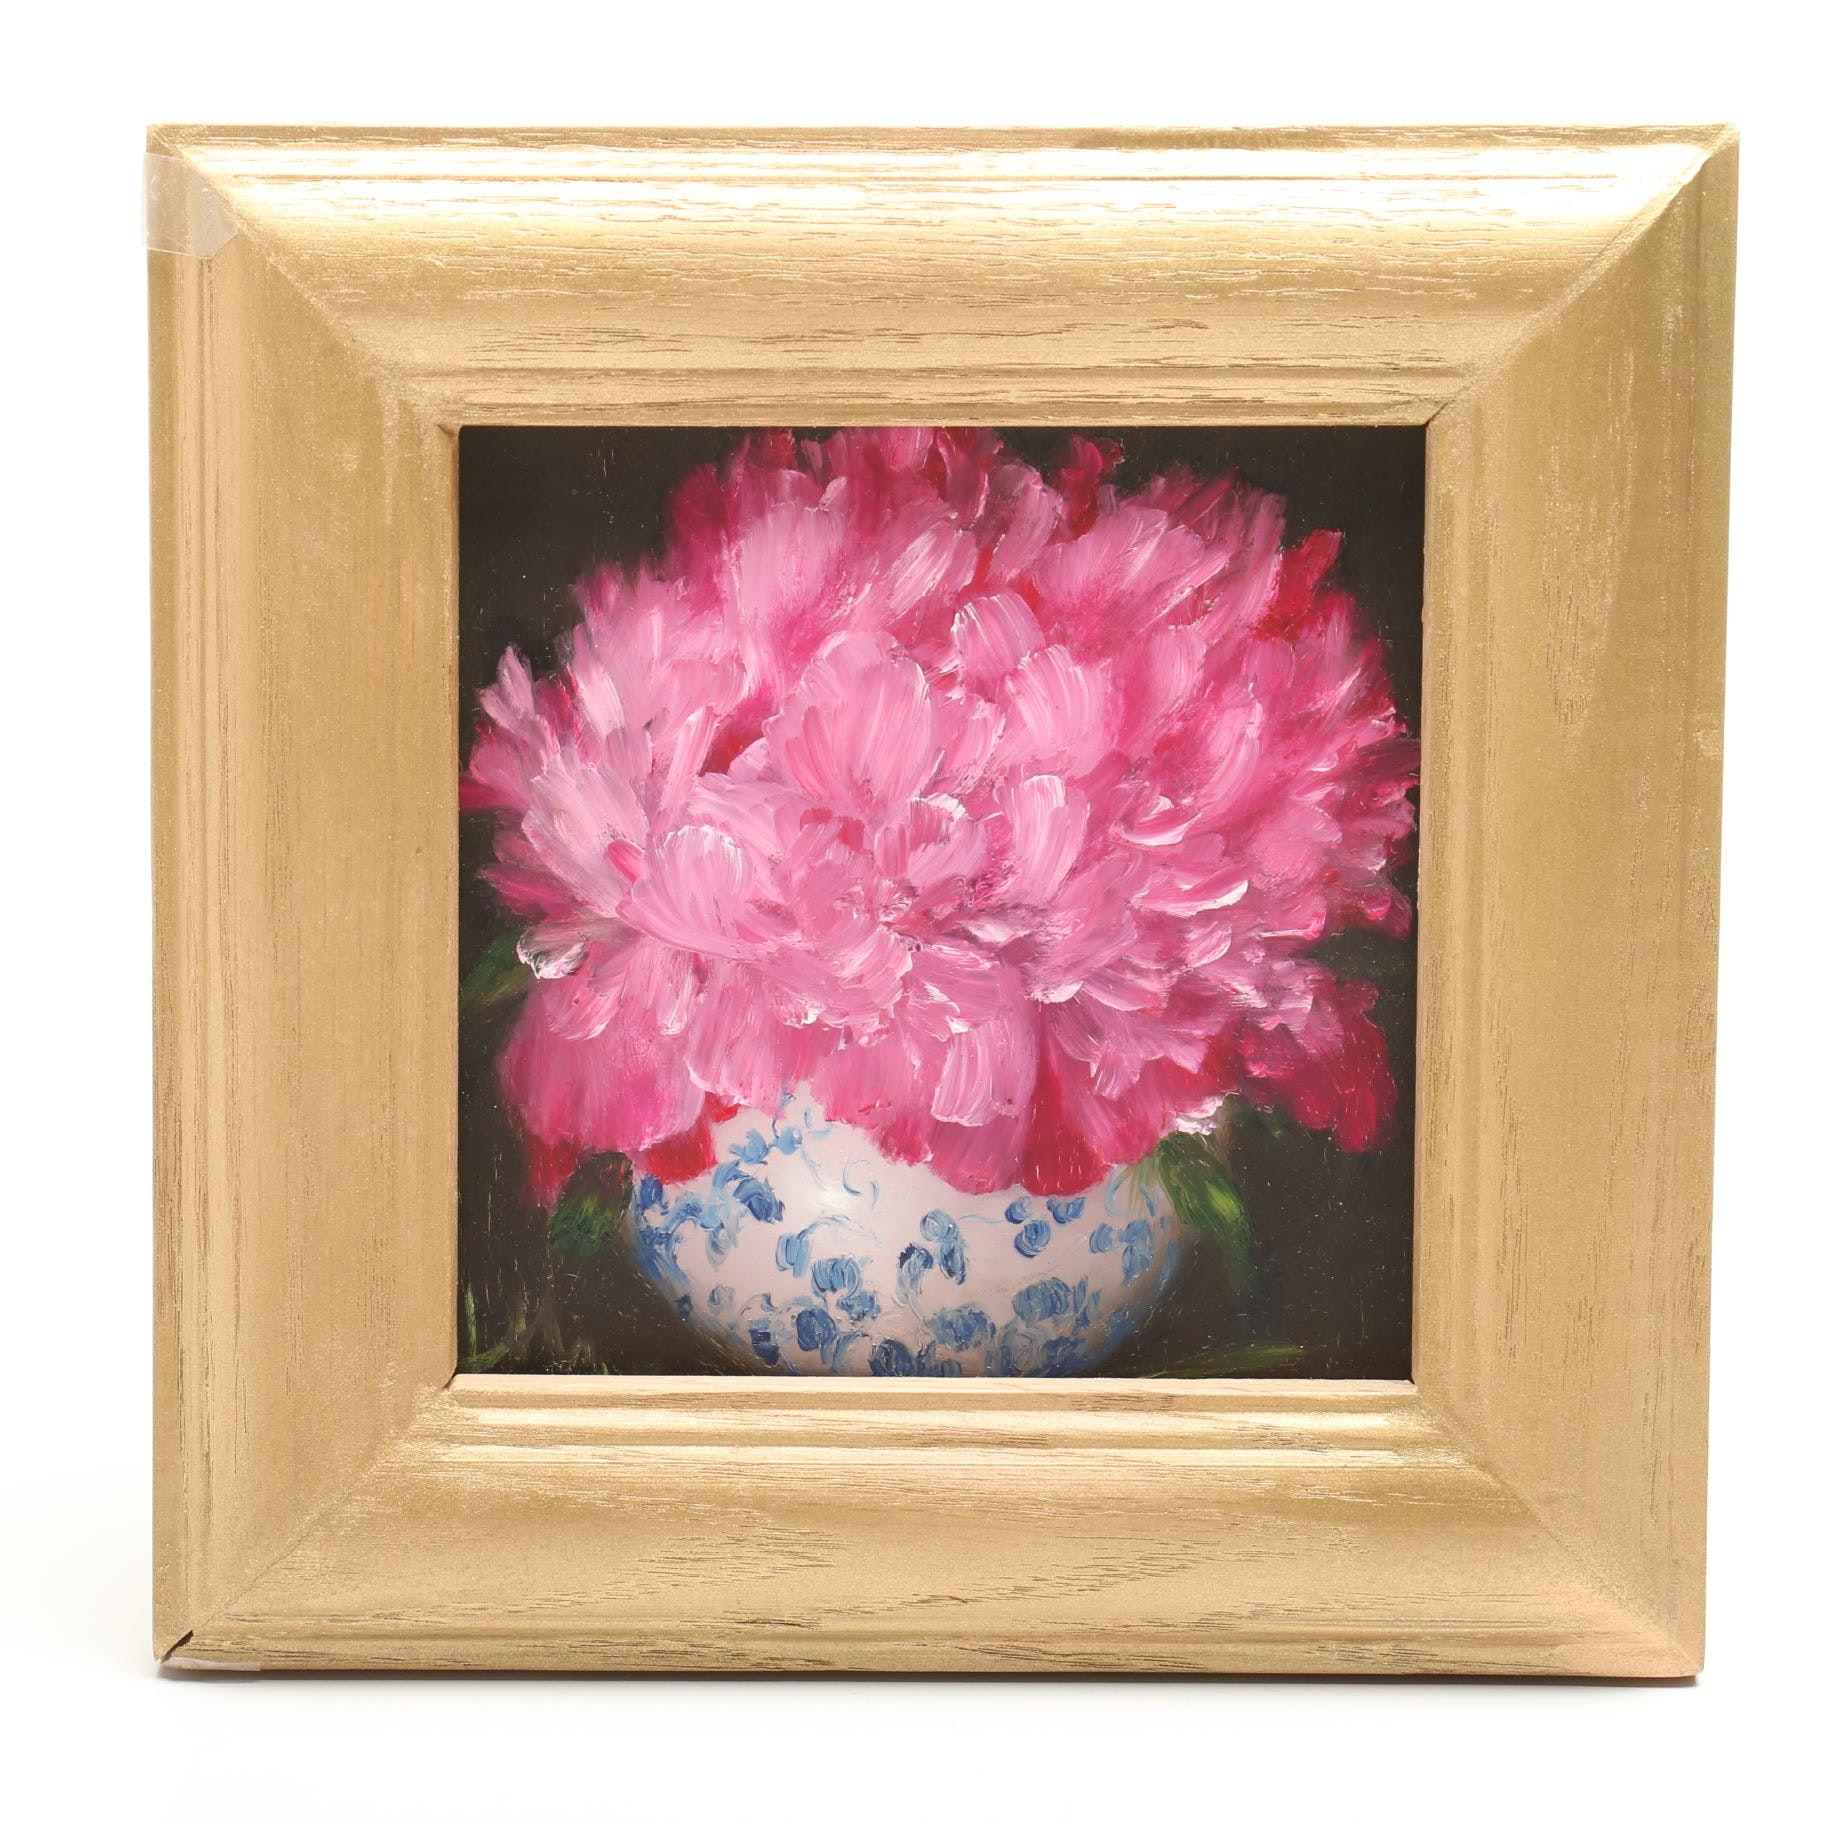 T. T. Tran Floral Still Life Oil Painting